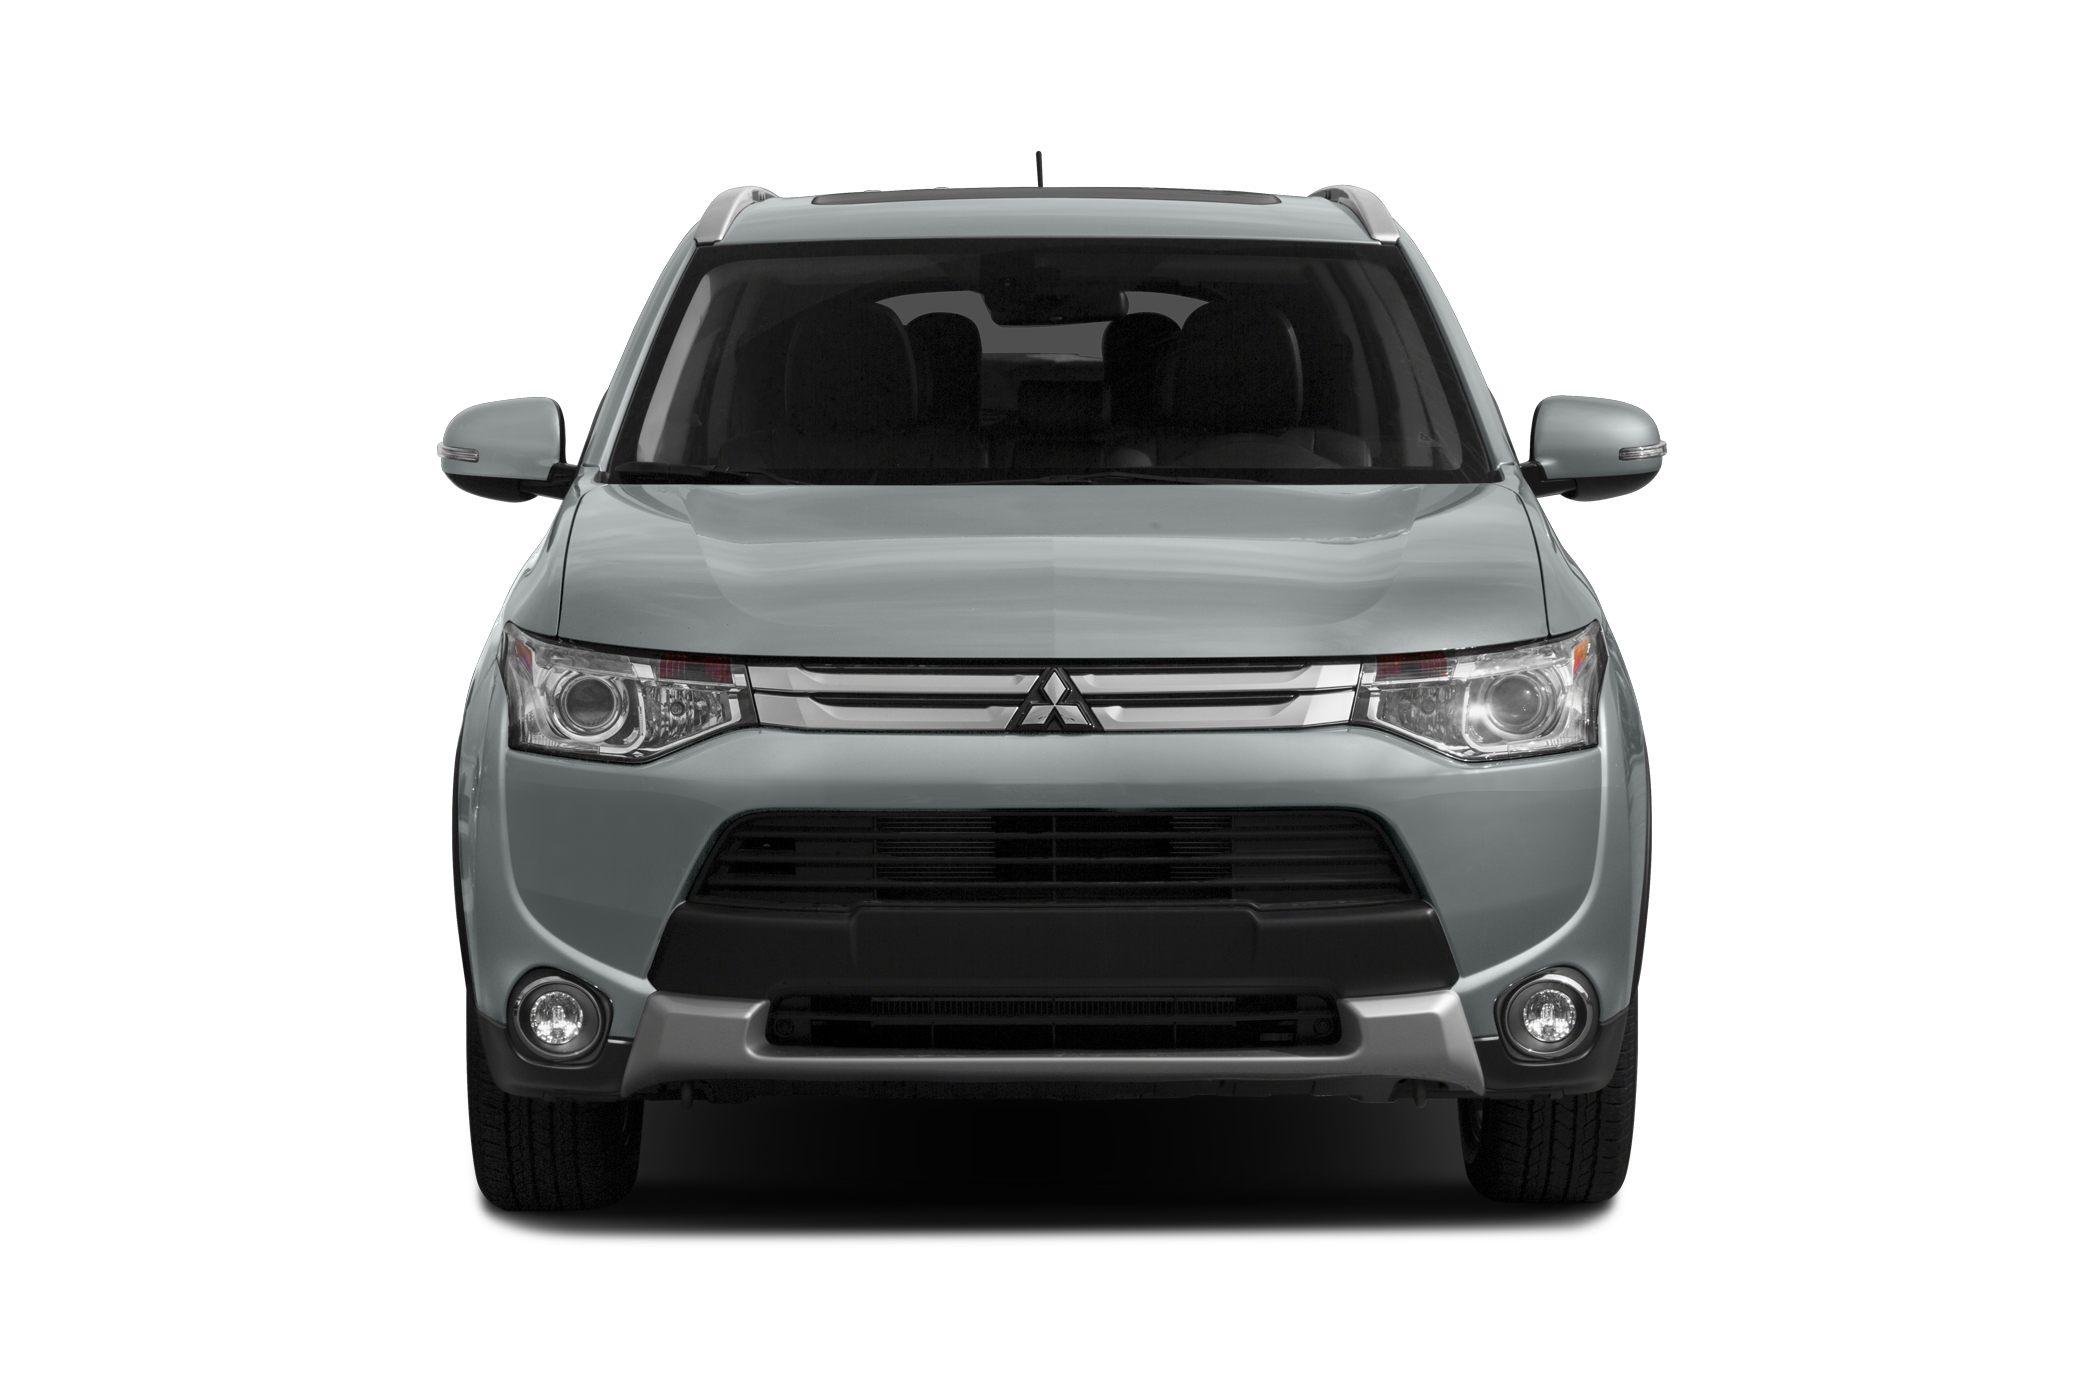 2015 Mitsubishi Car 6 High Resolution Wallpaper